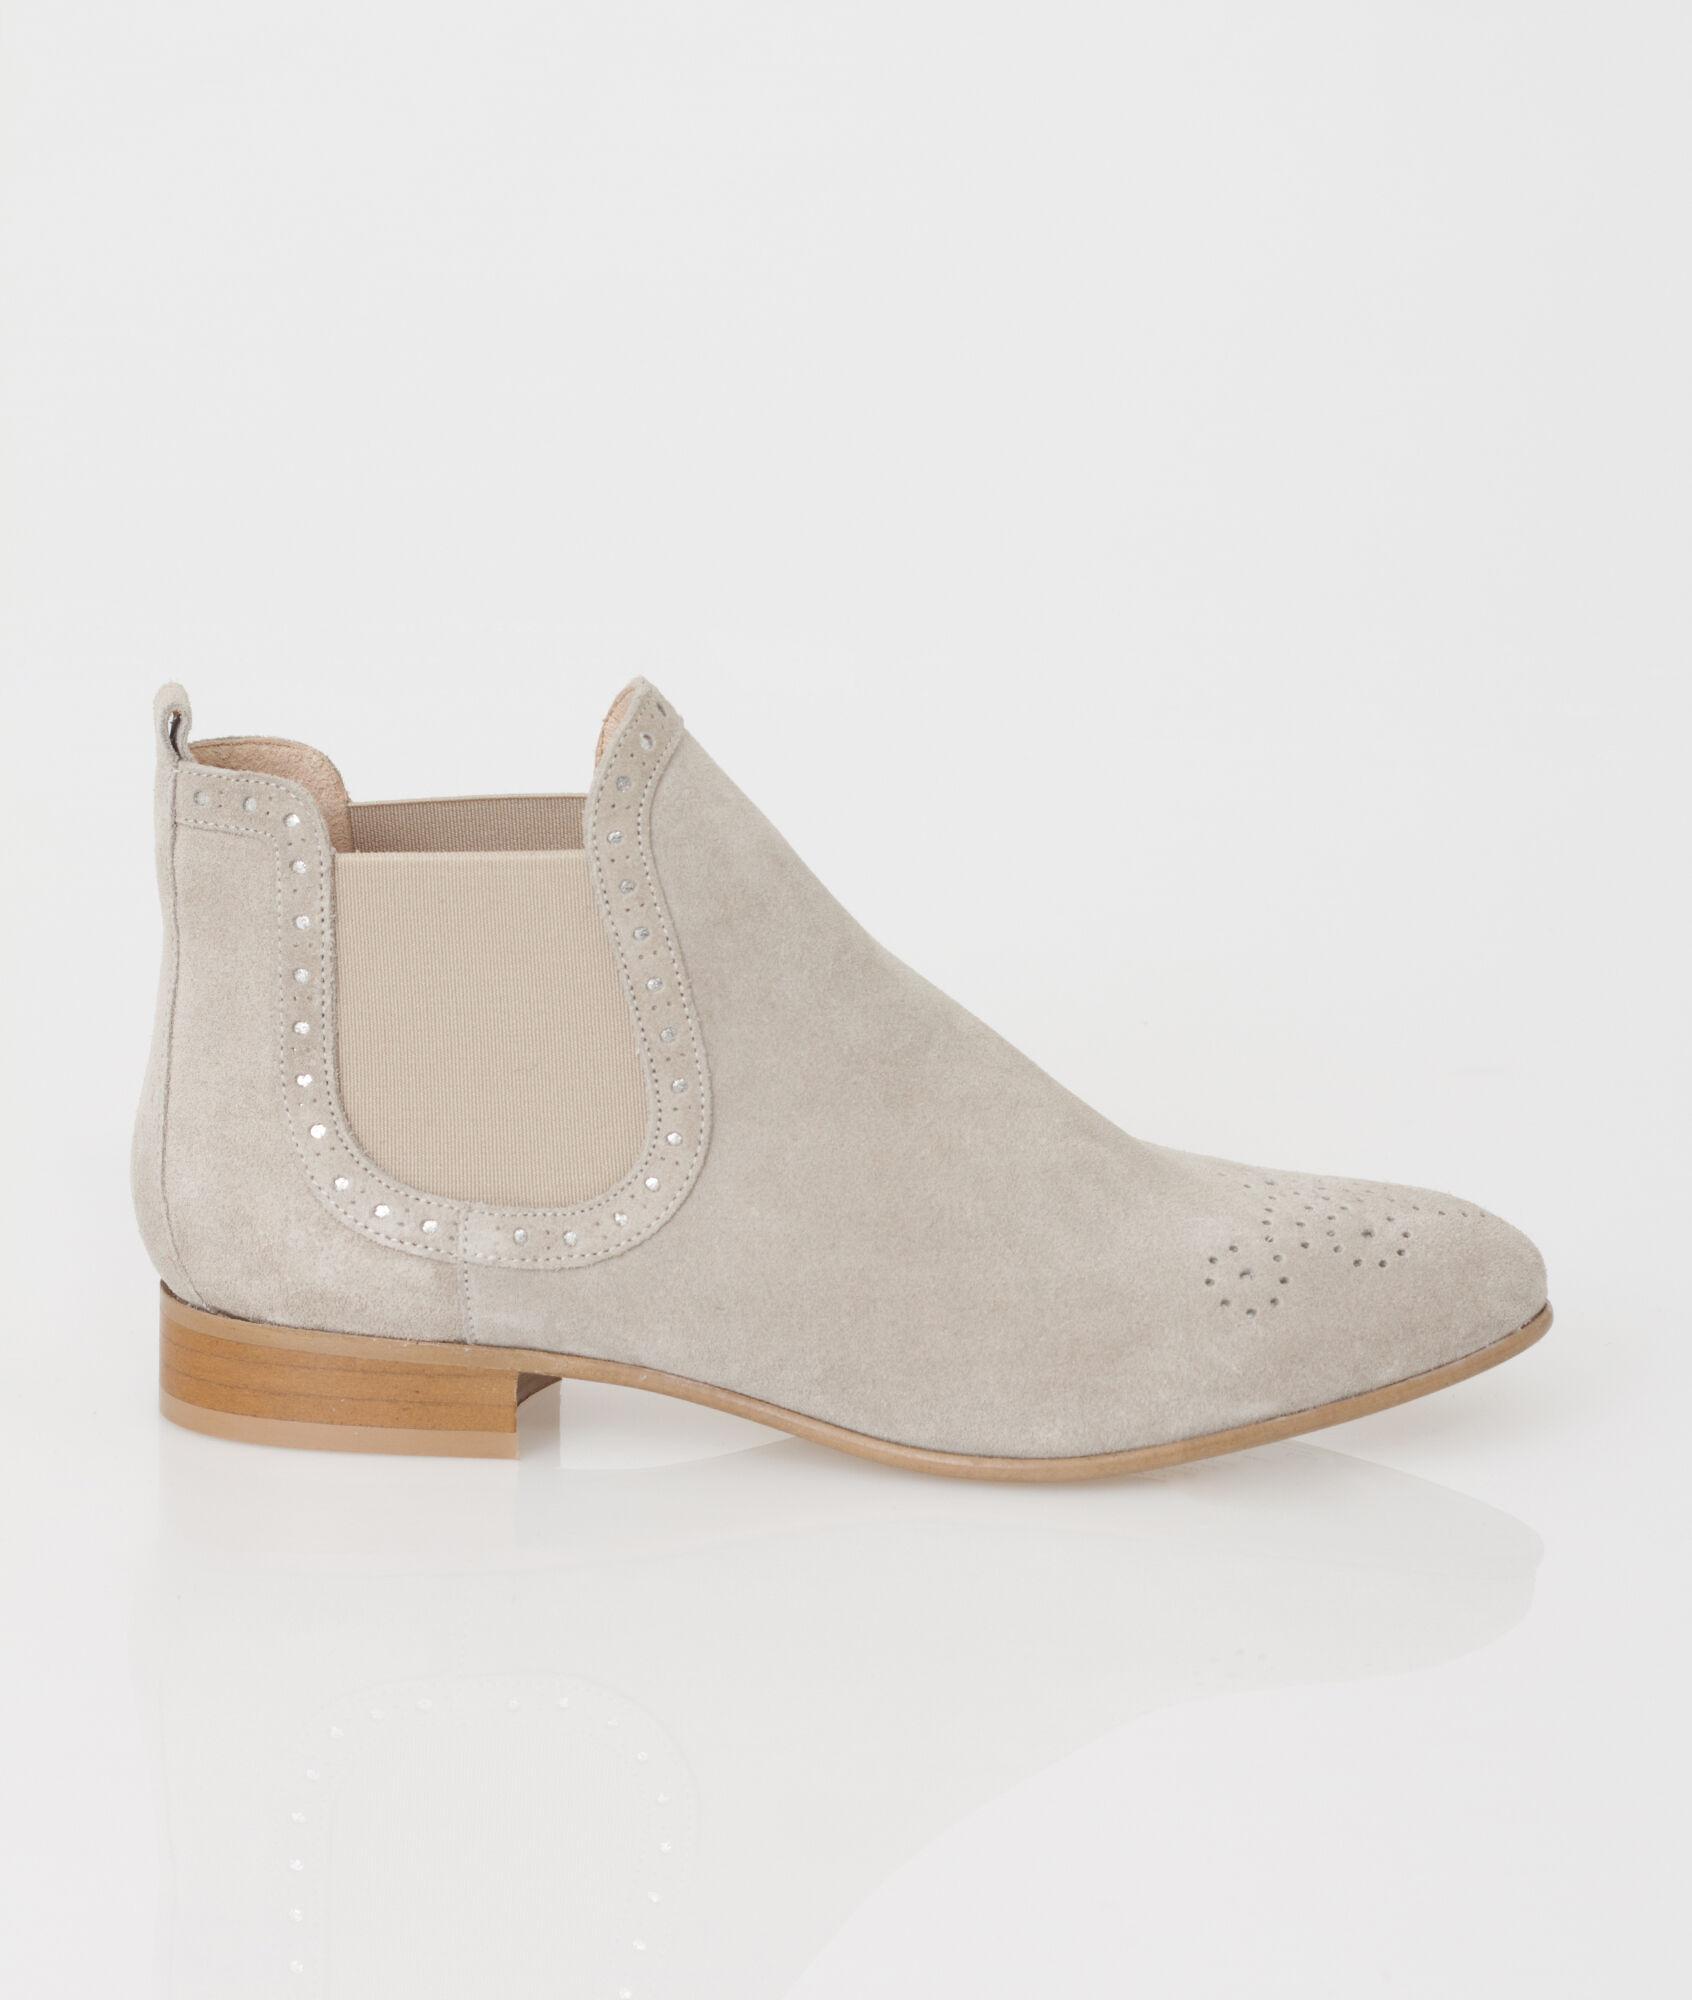 magasin tamaris chaussure bruxelles